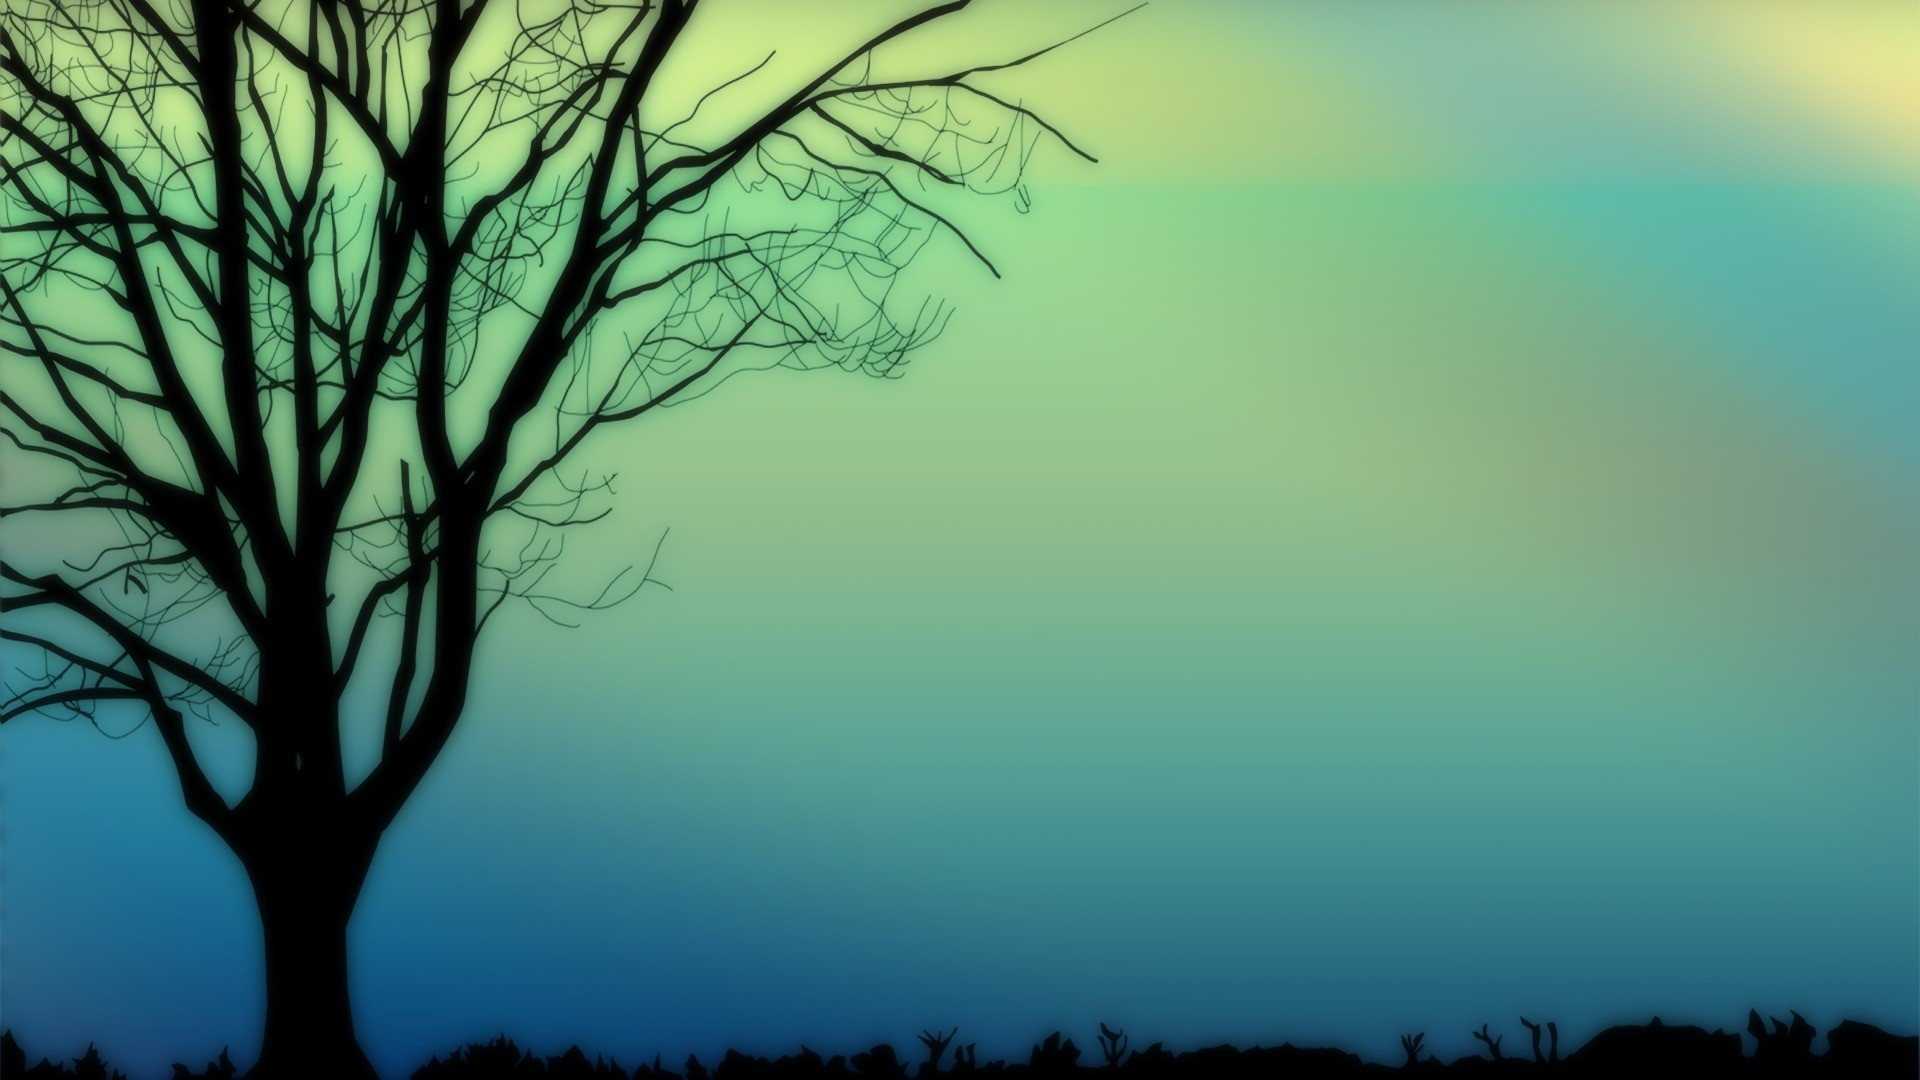 Tree Minimalist Picture